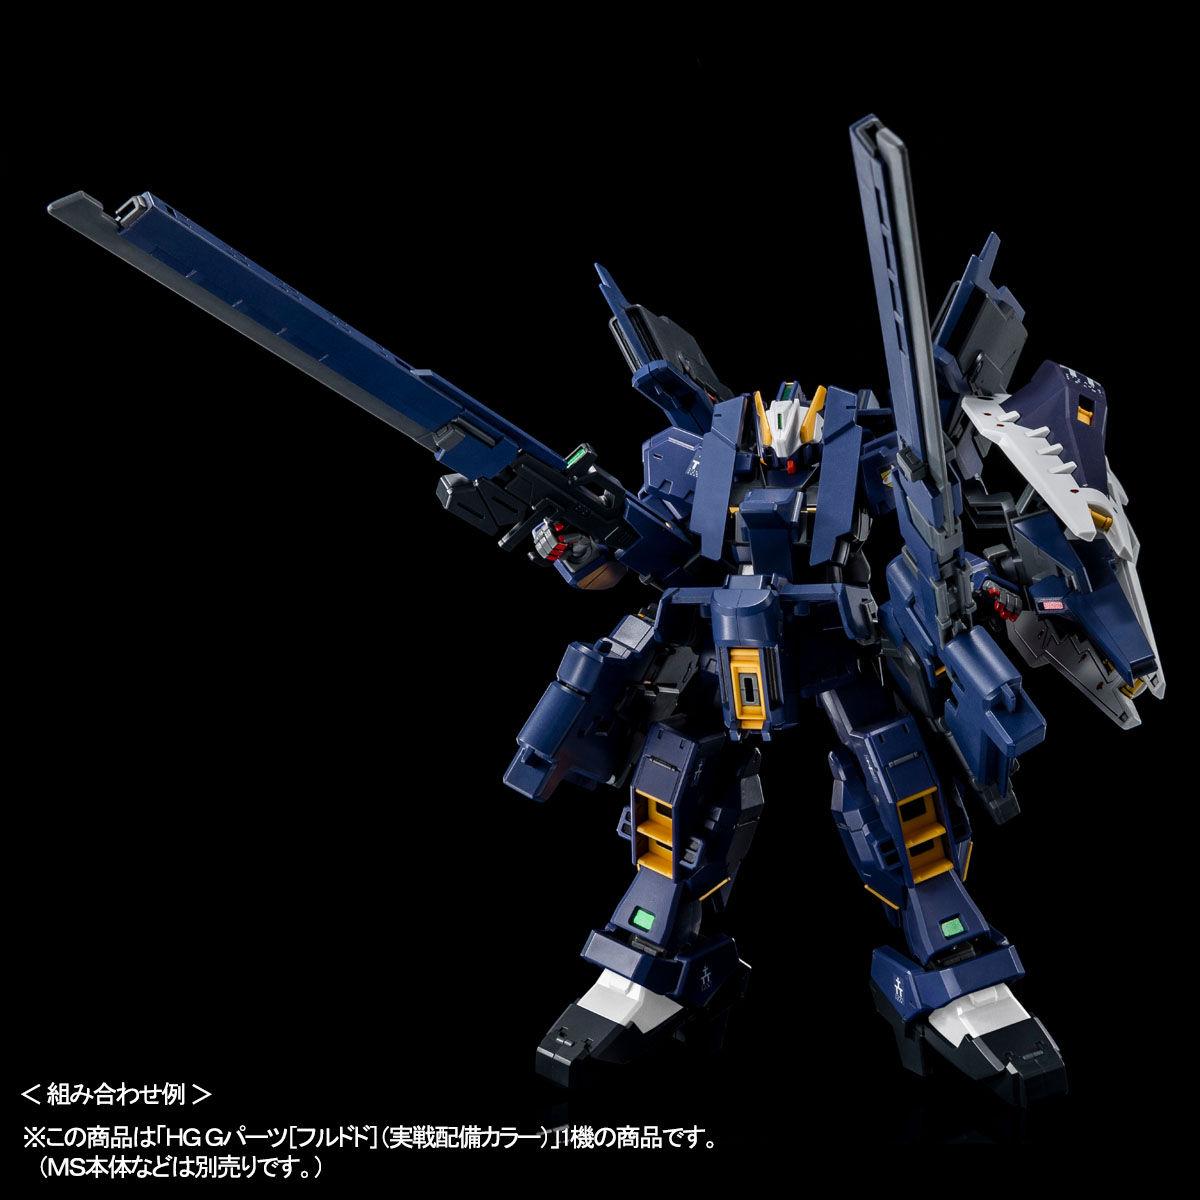 RX-121-1+FF-X29A ガンダムTR-1〈ヘイズル・ラー〉 (第二形態)